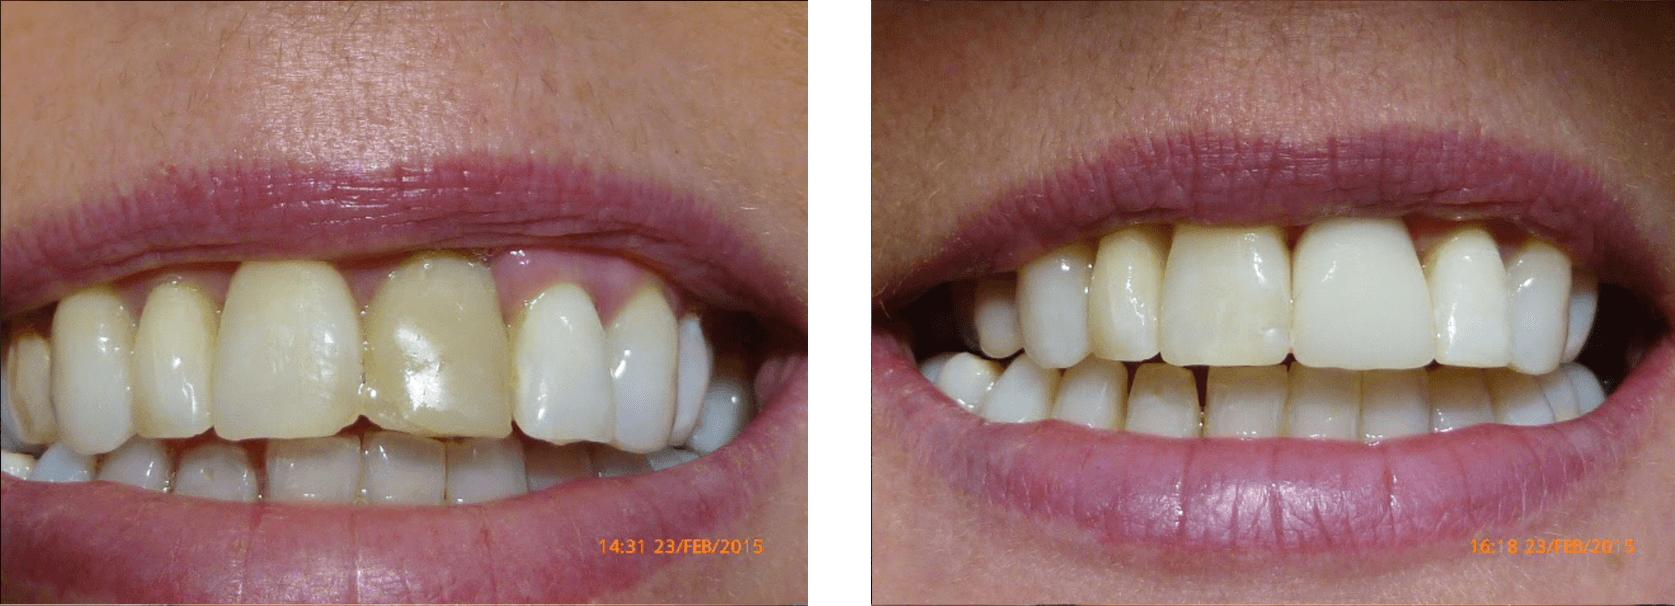 digital-dentistry-douglas-ramsey-castletown-traceybell